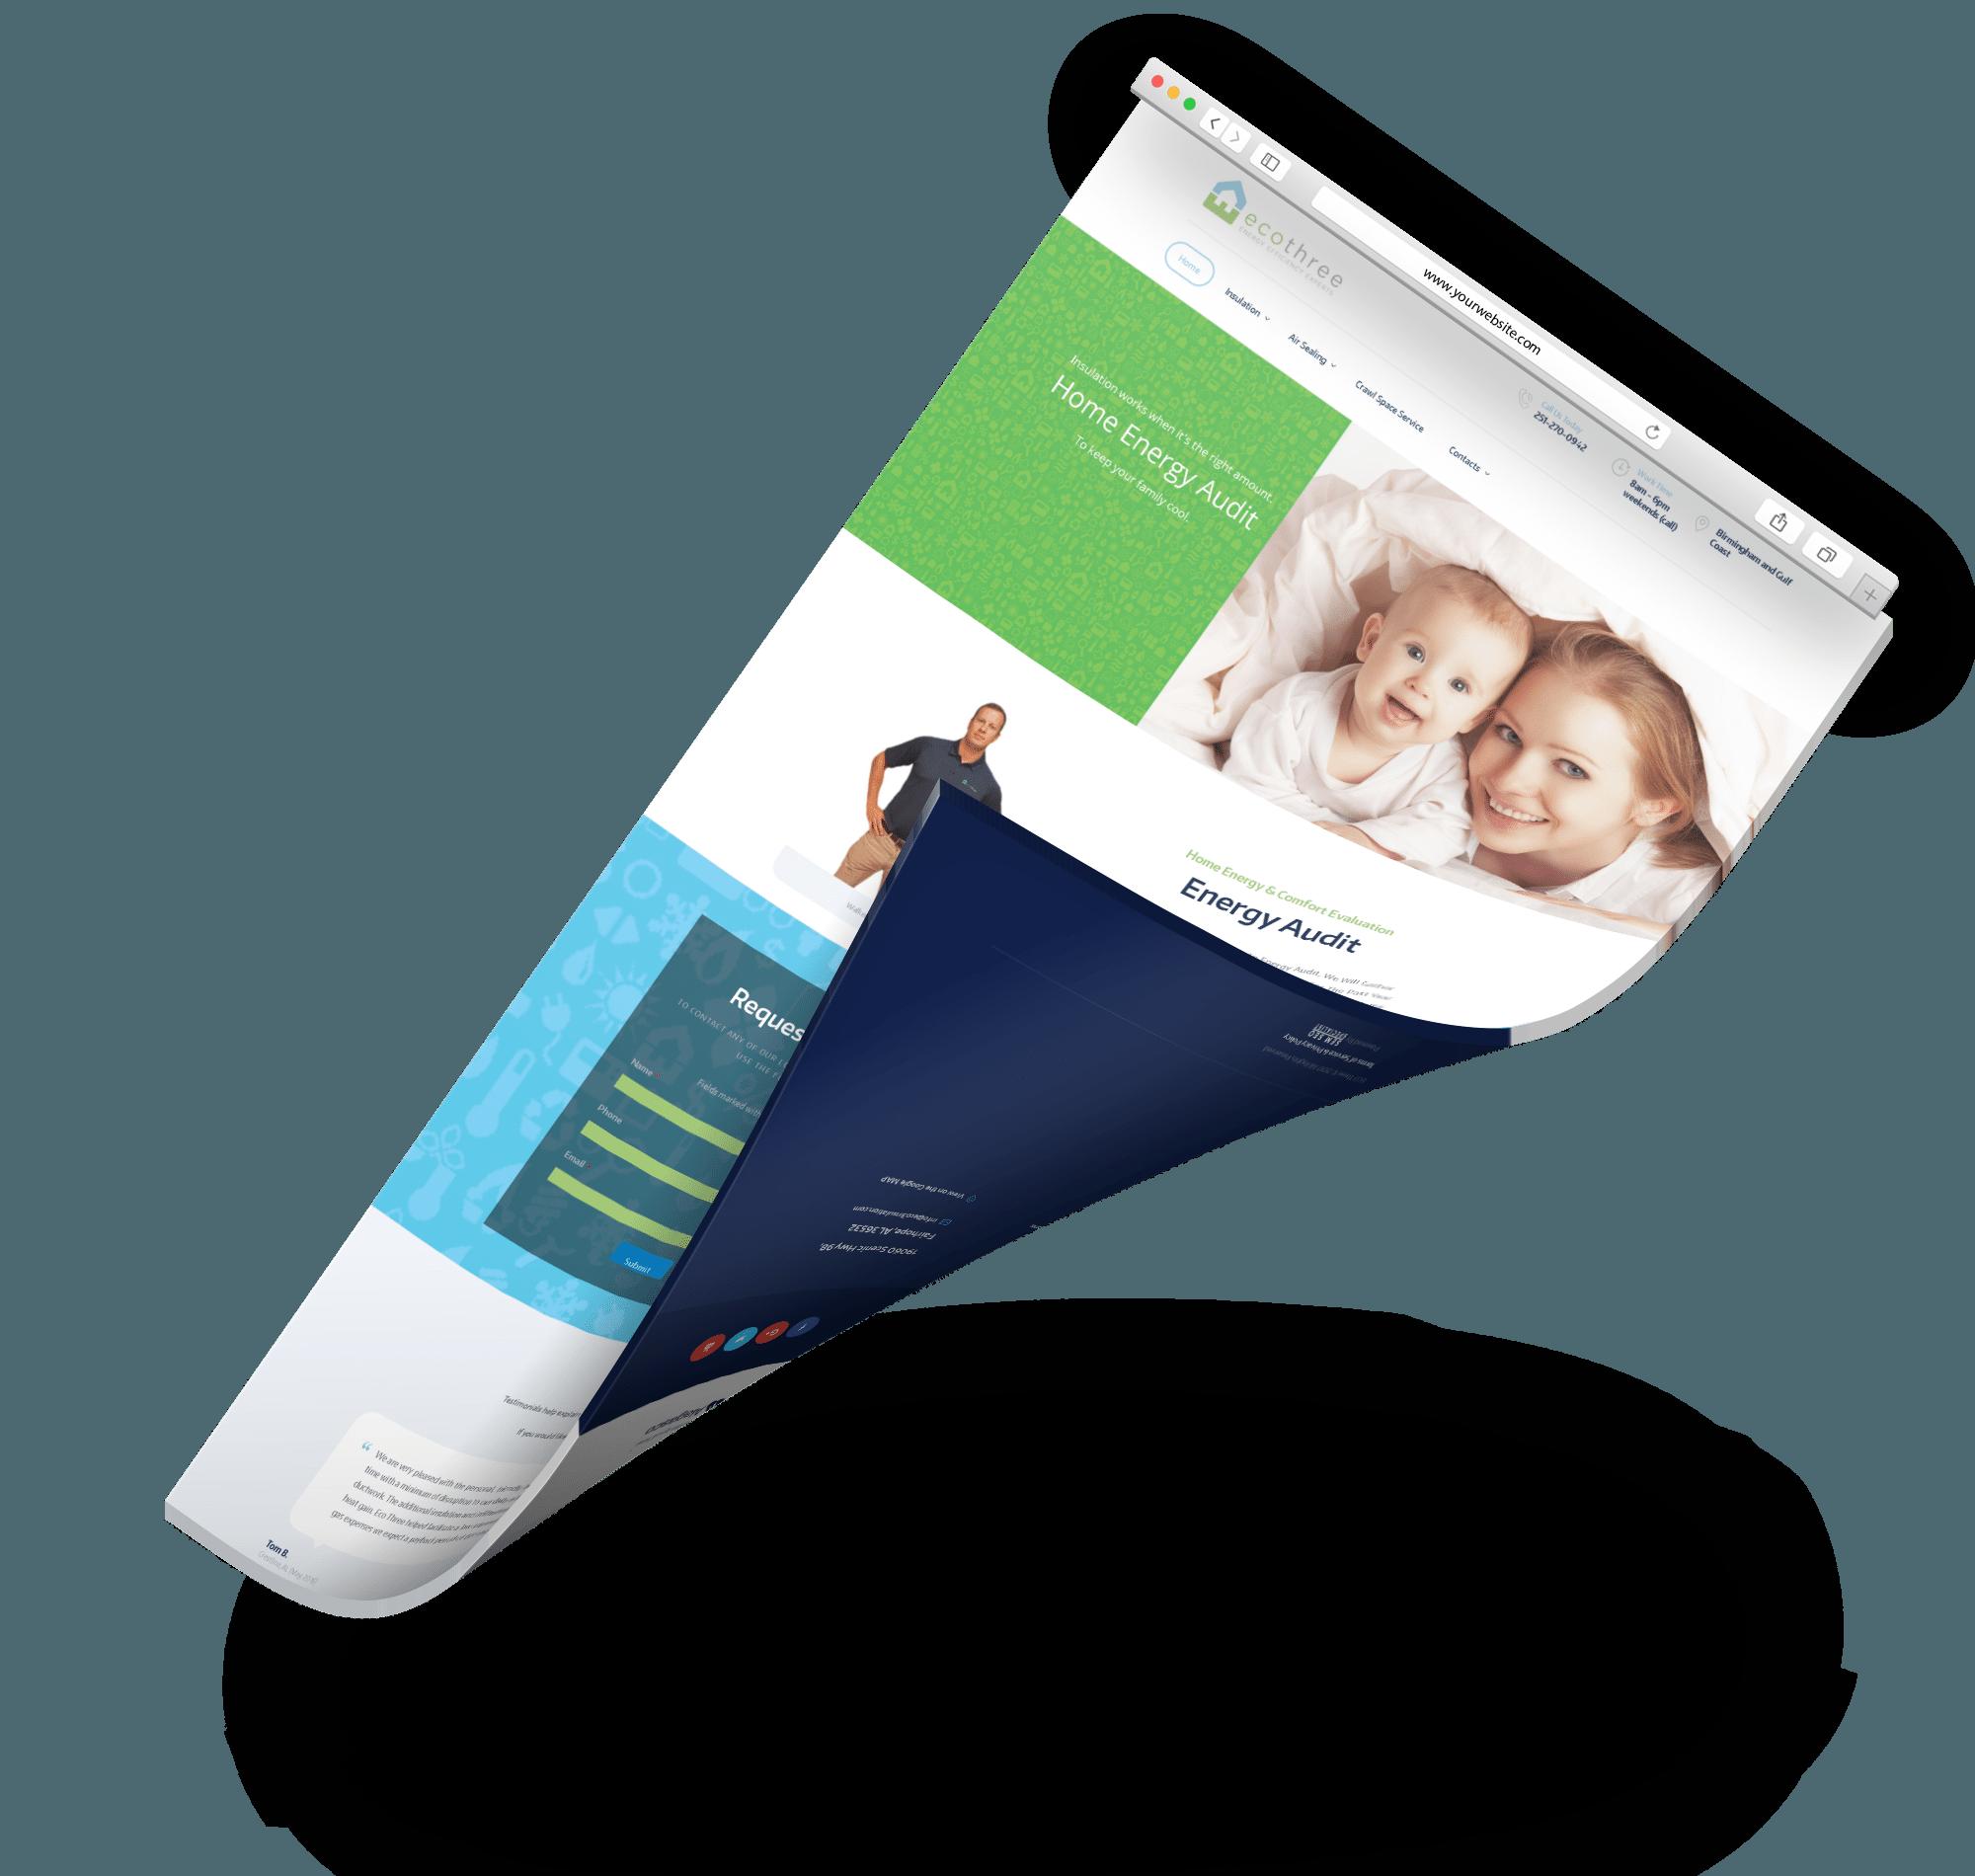 eco three web design service sem seo specialist